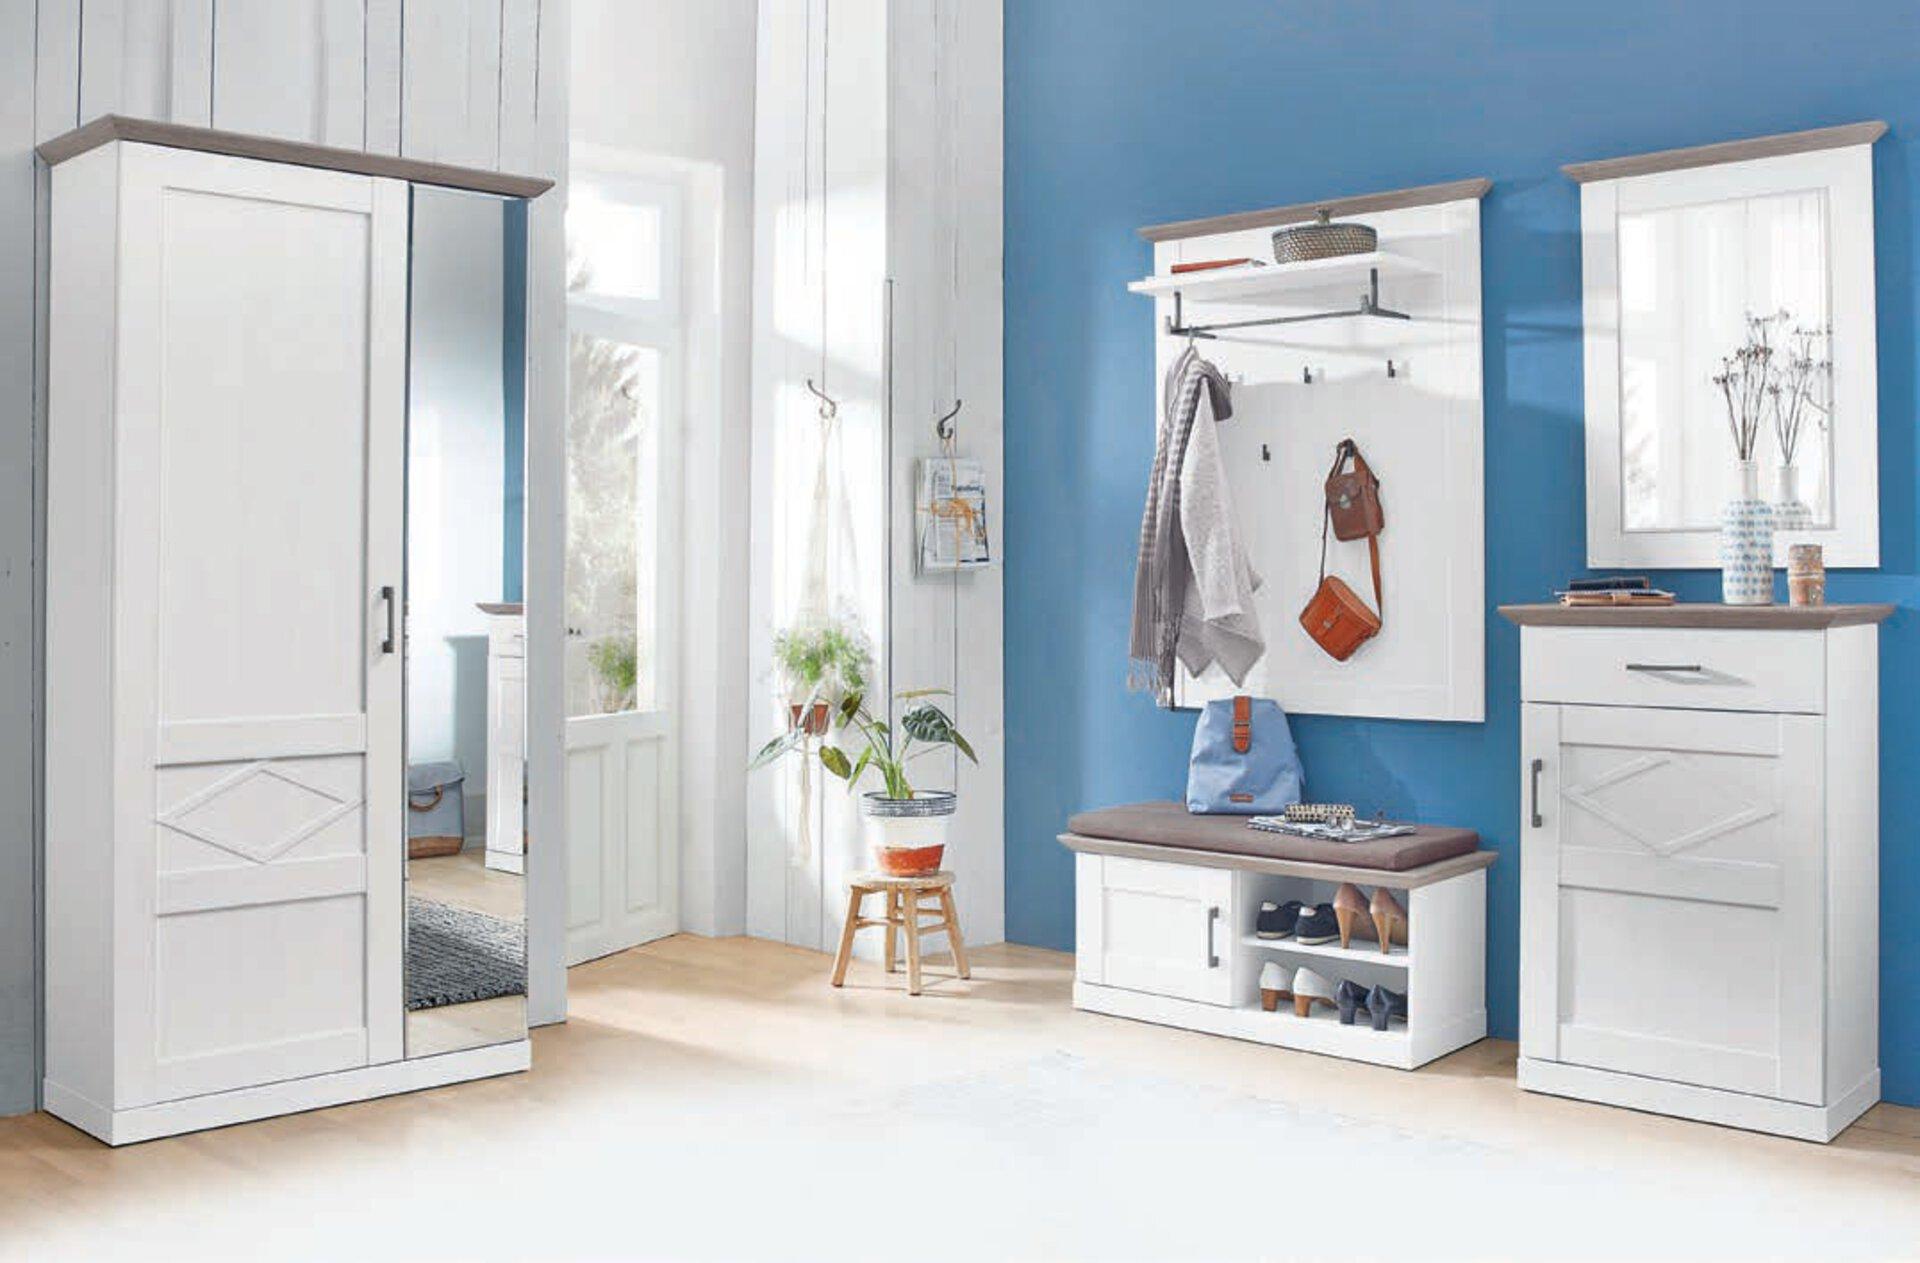 Garderobenpaneel COUNTRY Vito Holzwerkstoff braun 30 x 125 x 97 cm